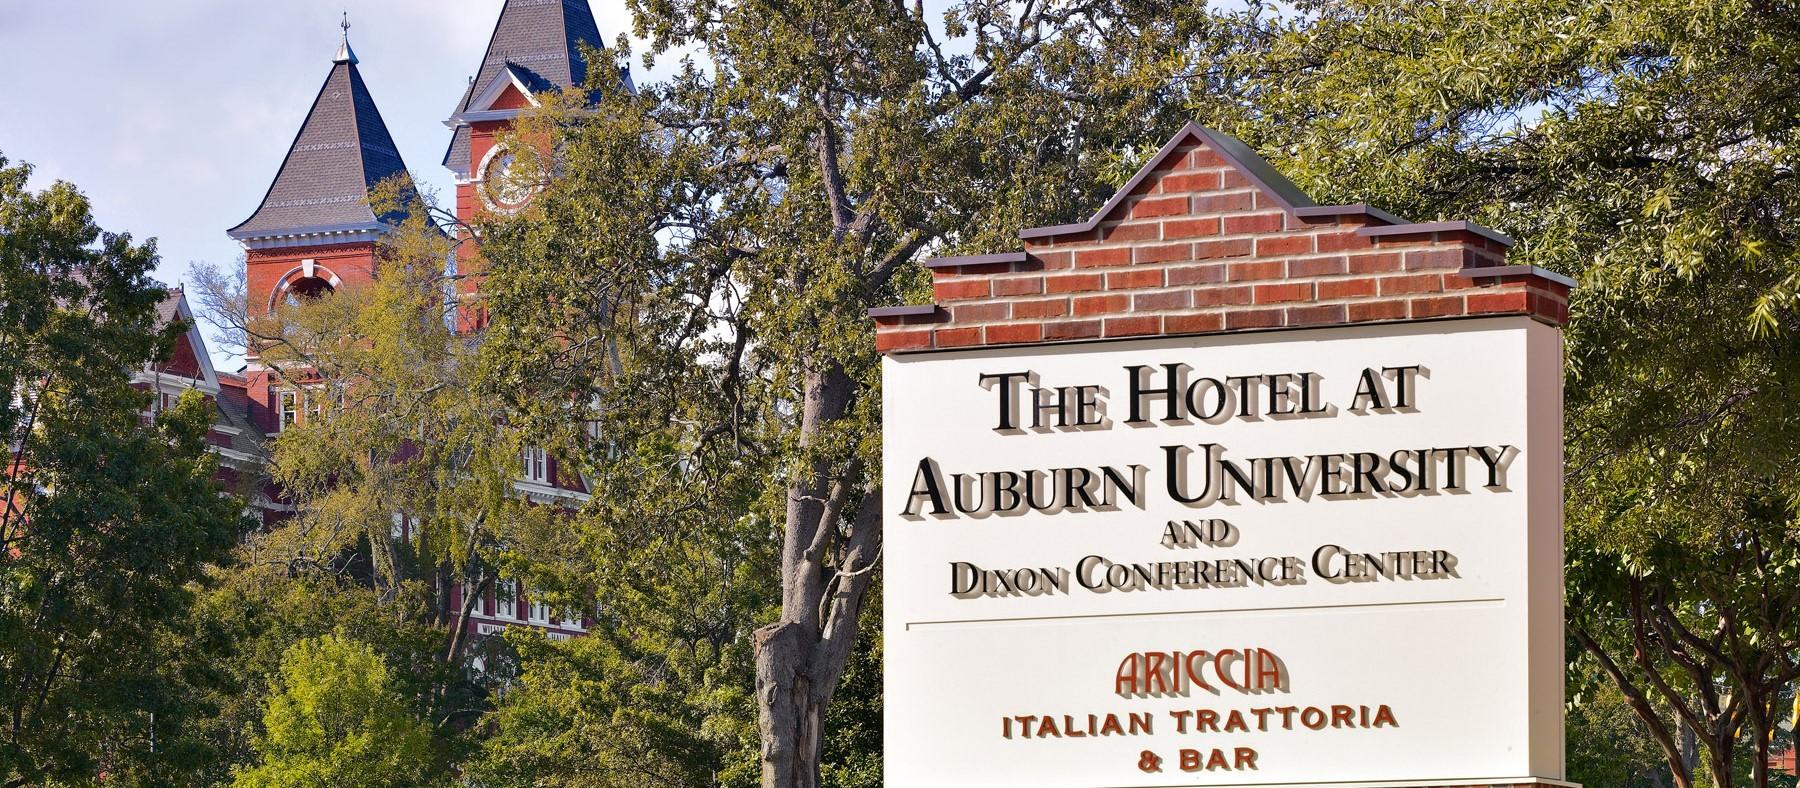 The Hotel at Auburn University & Dixon Conference Center